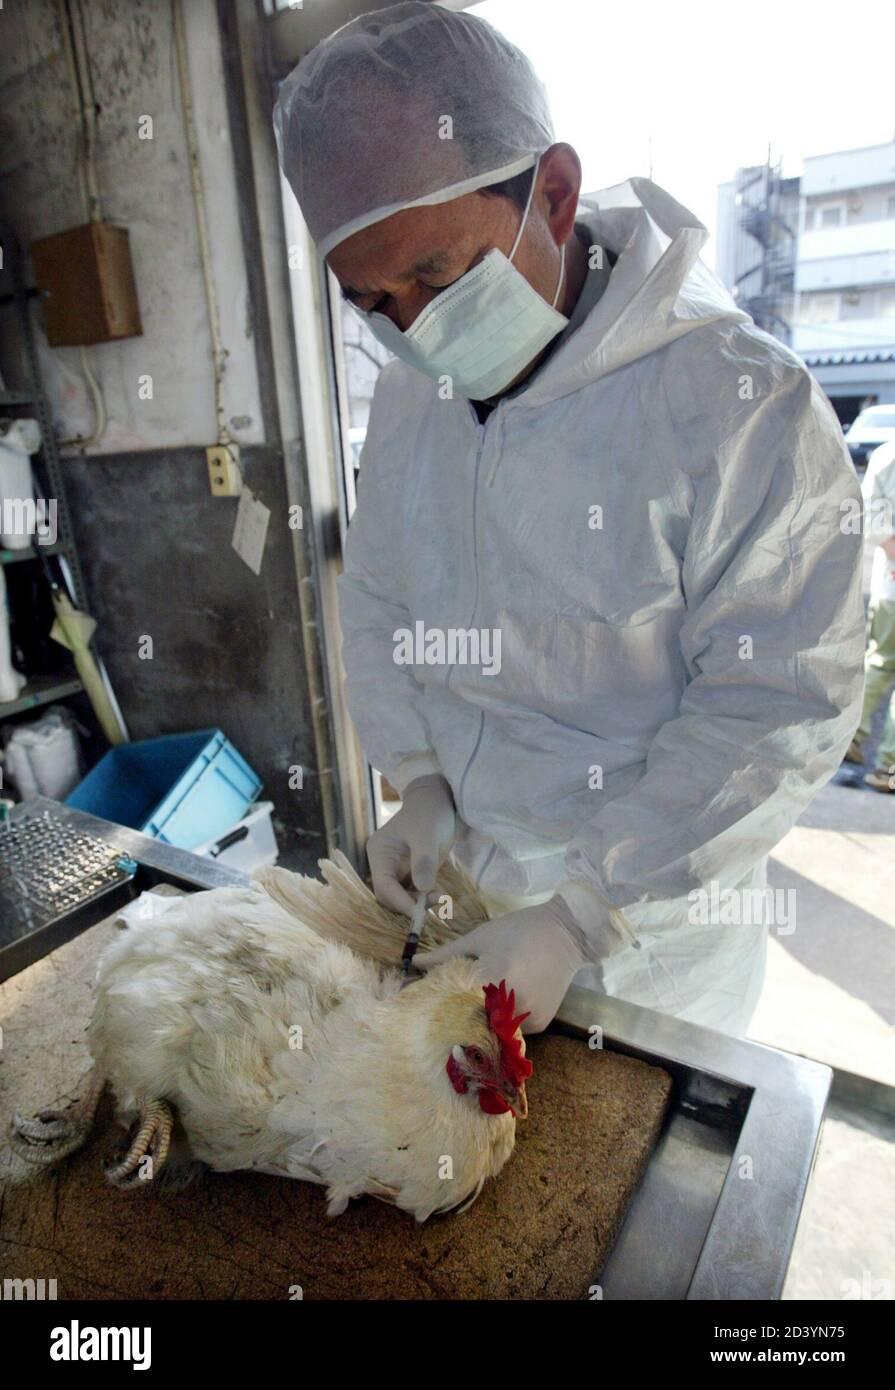 Kanagawa Livestock Hygiene Station Deputy Director Shigeru Hagiwara Draws Blood From A Female Chicken For Testing For Diseases At The Kanagawa Livestock Hygiene Station In Atsugi West Of Tokyo February 12 2004